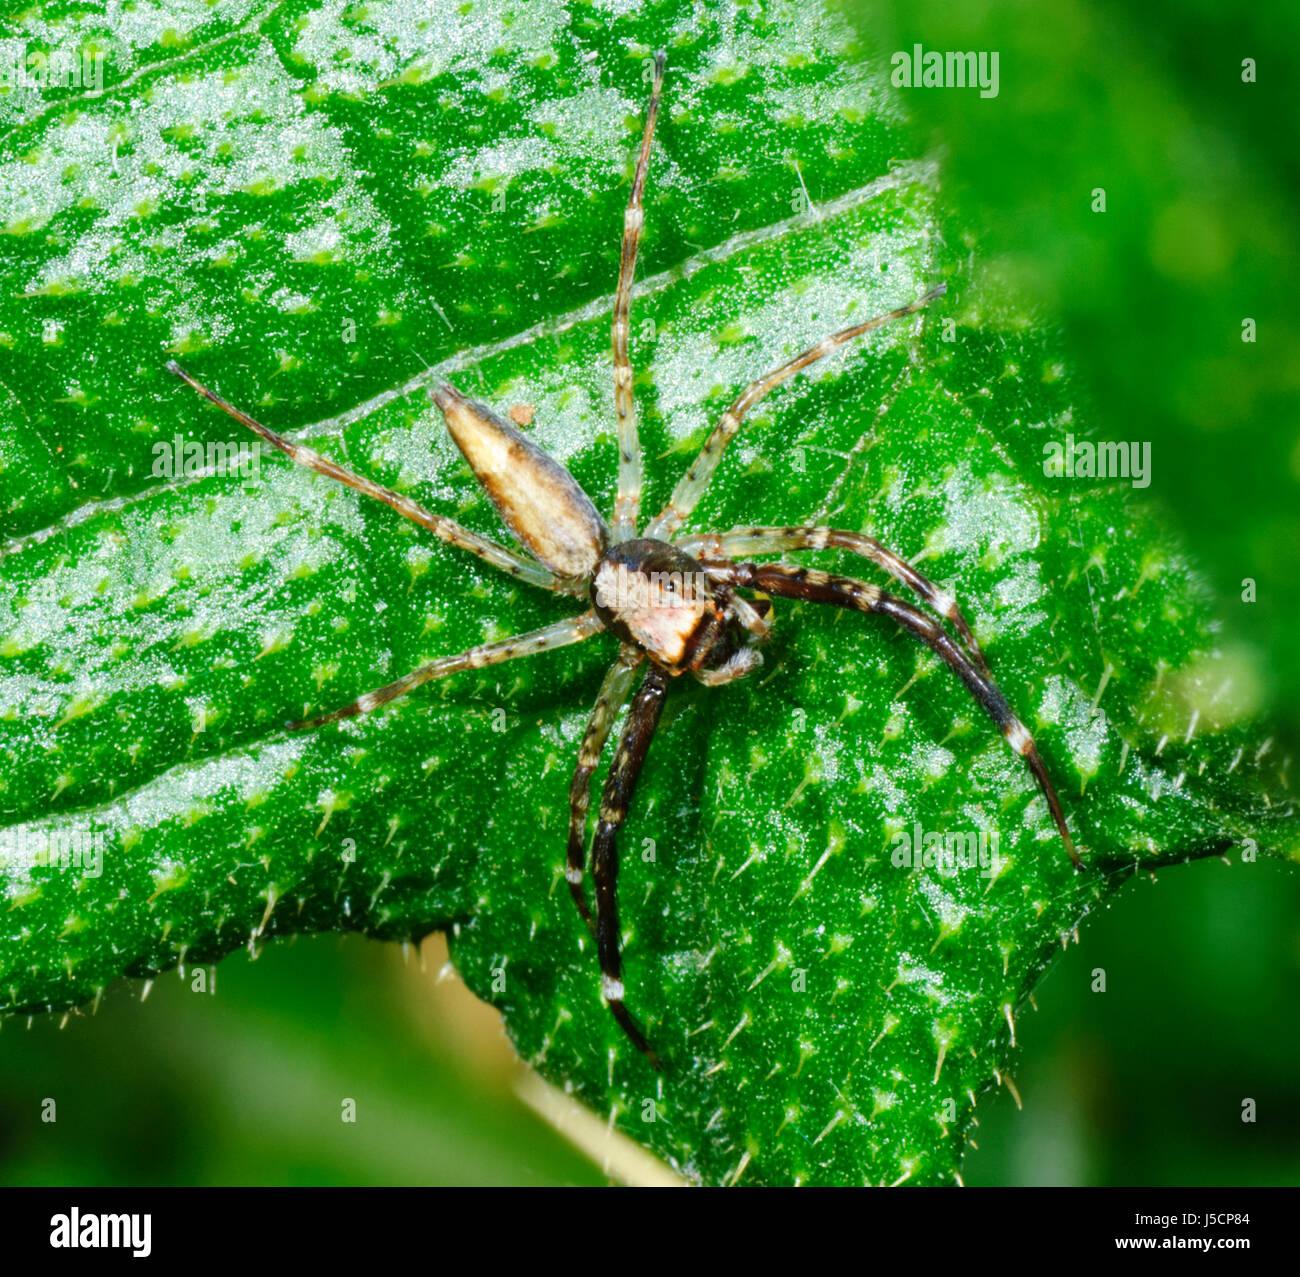 Araignée sauteuse menaçant (Helpis minitabunda), New South Wales, NSW, Australie Photo Stock